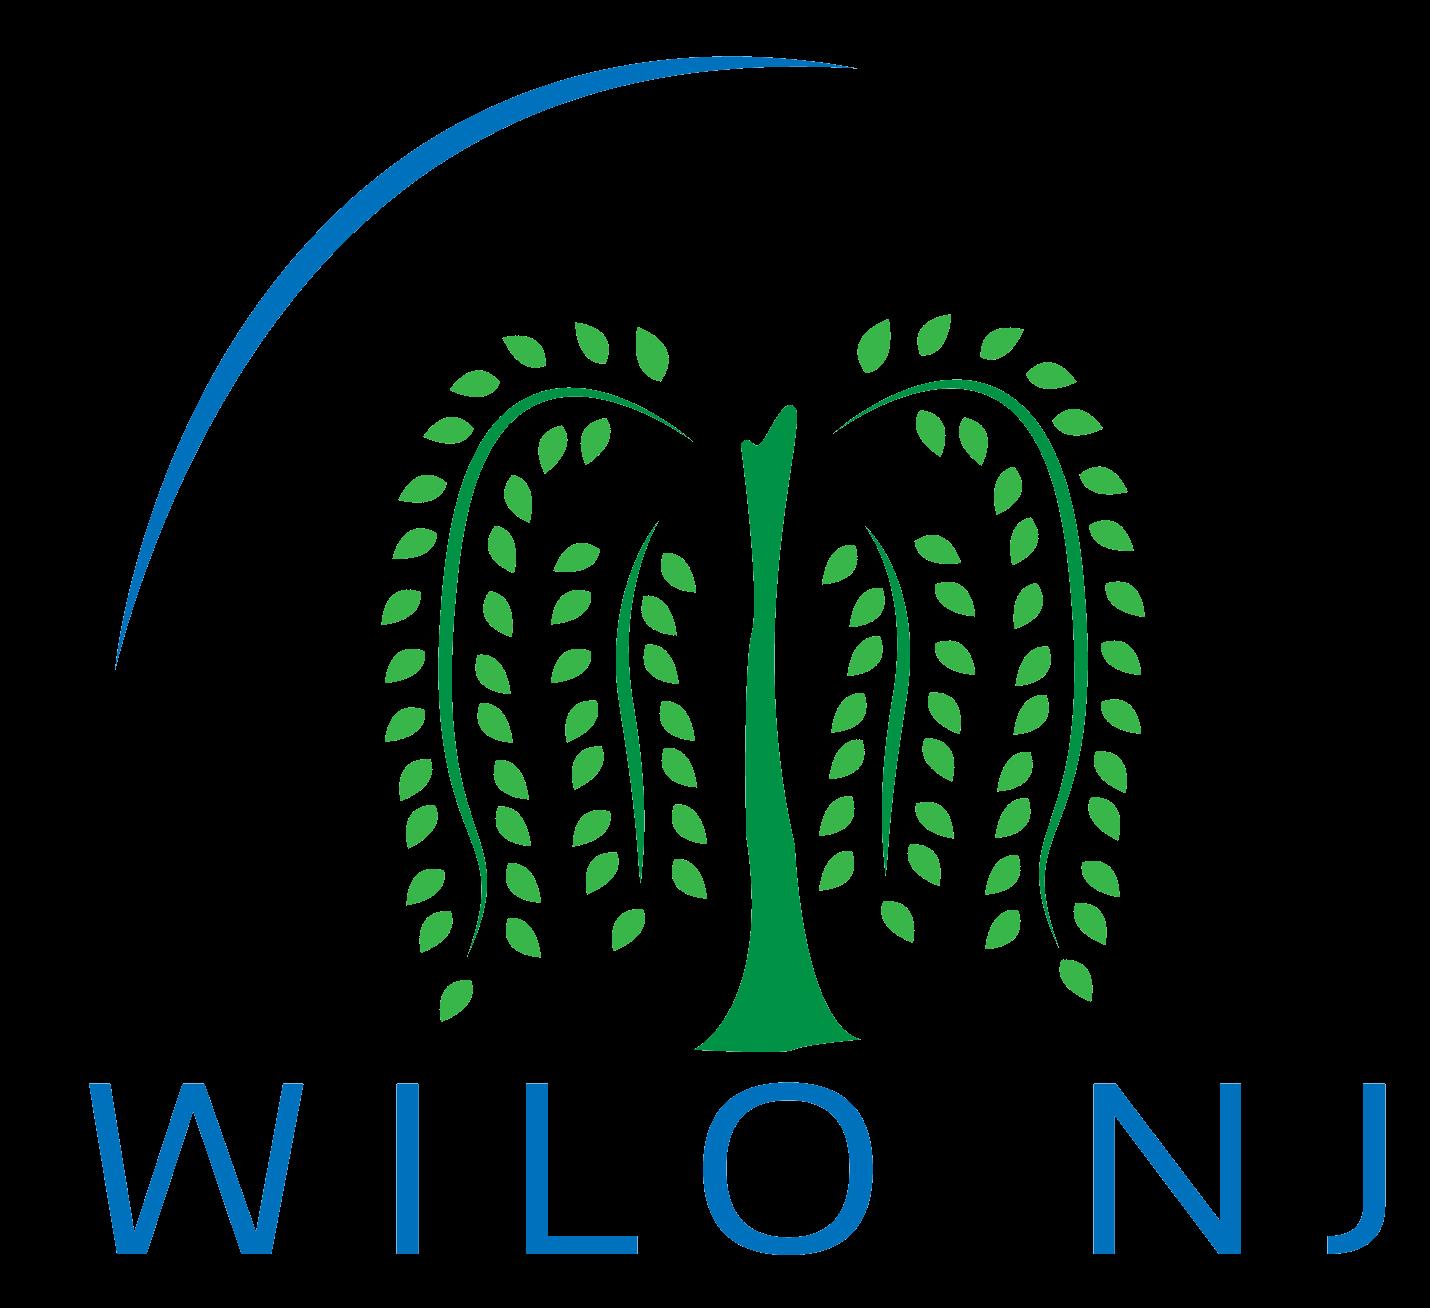 WILO NJ